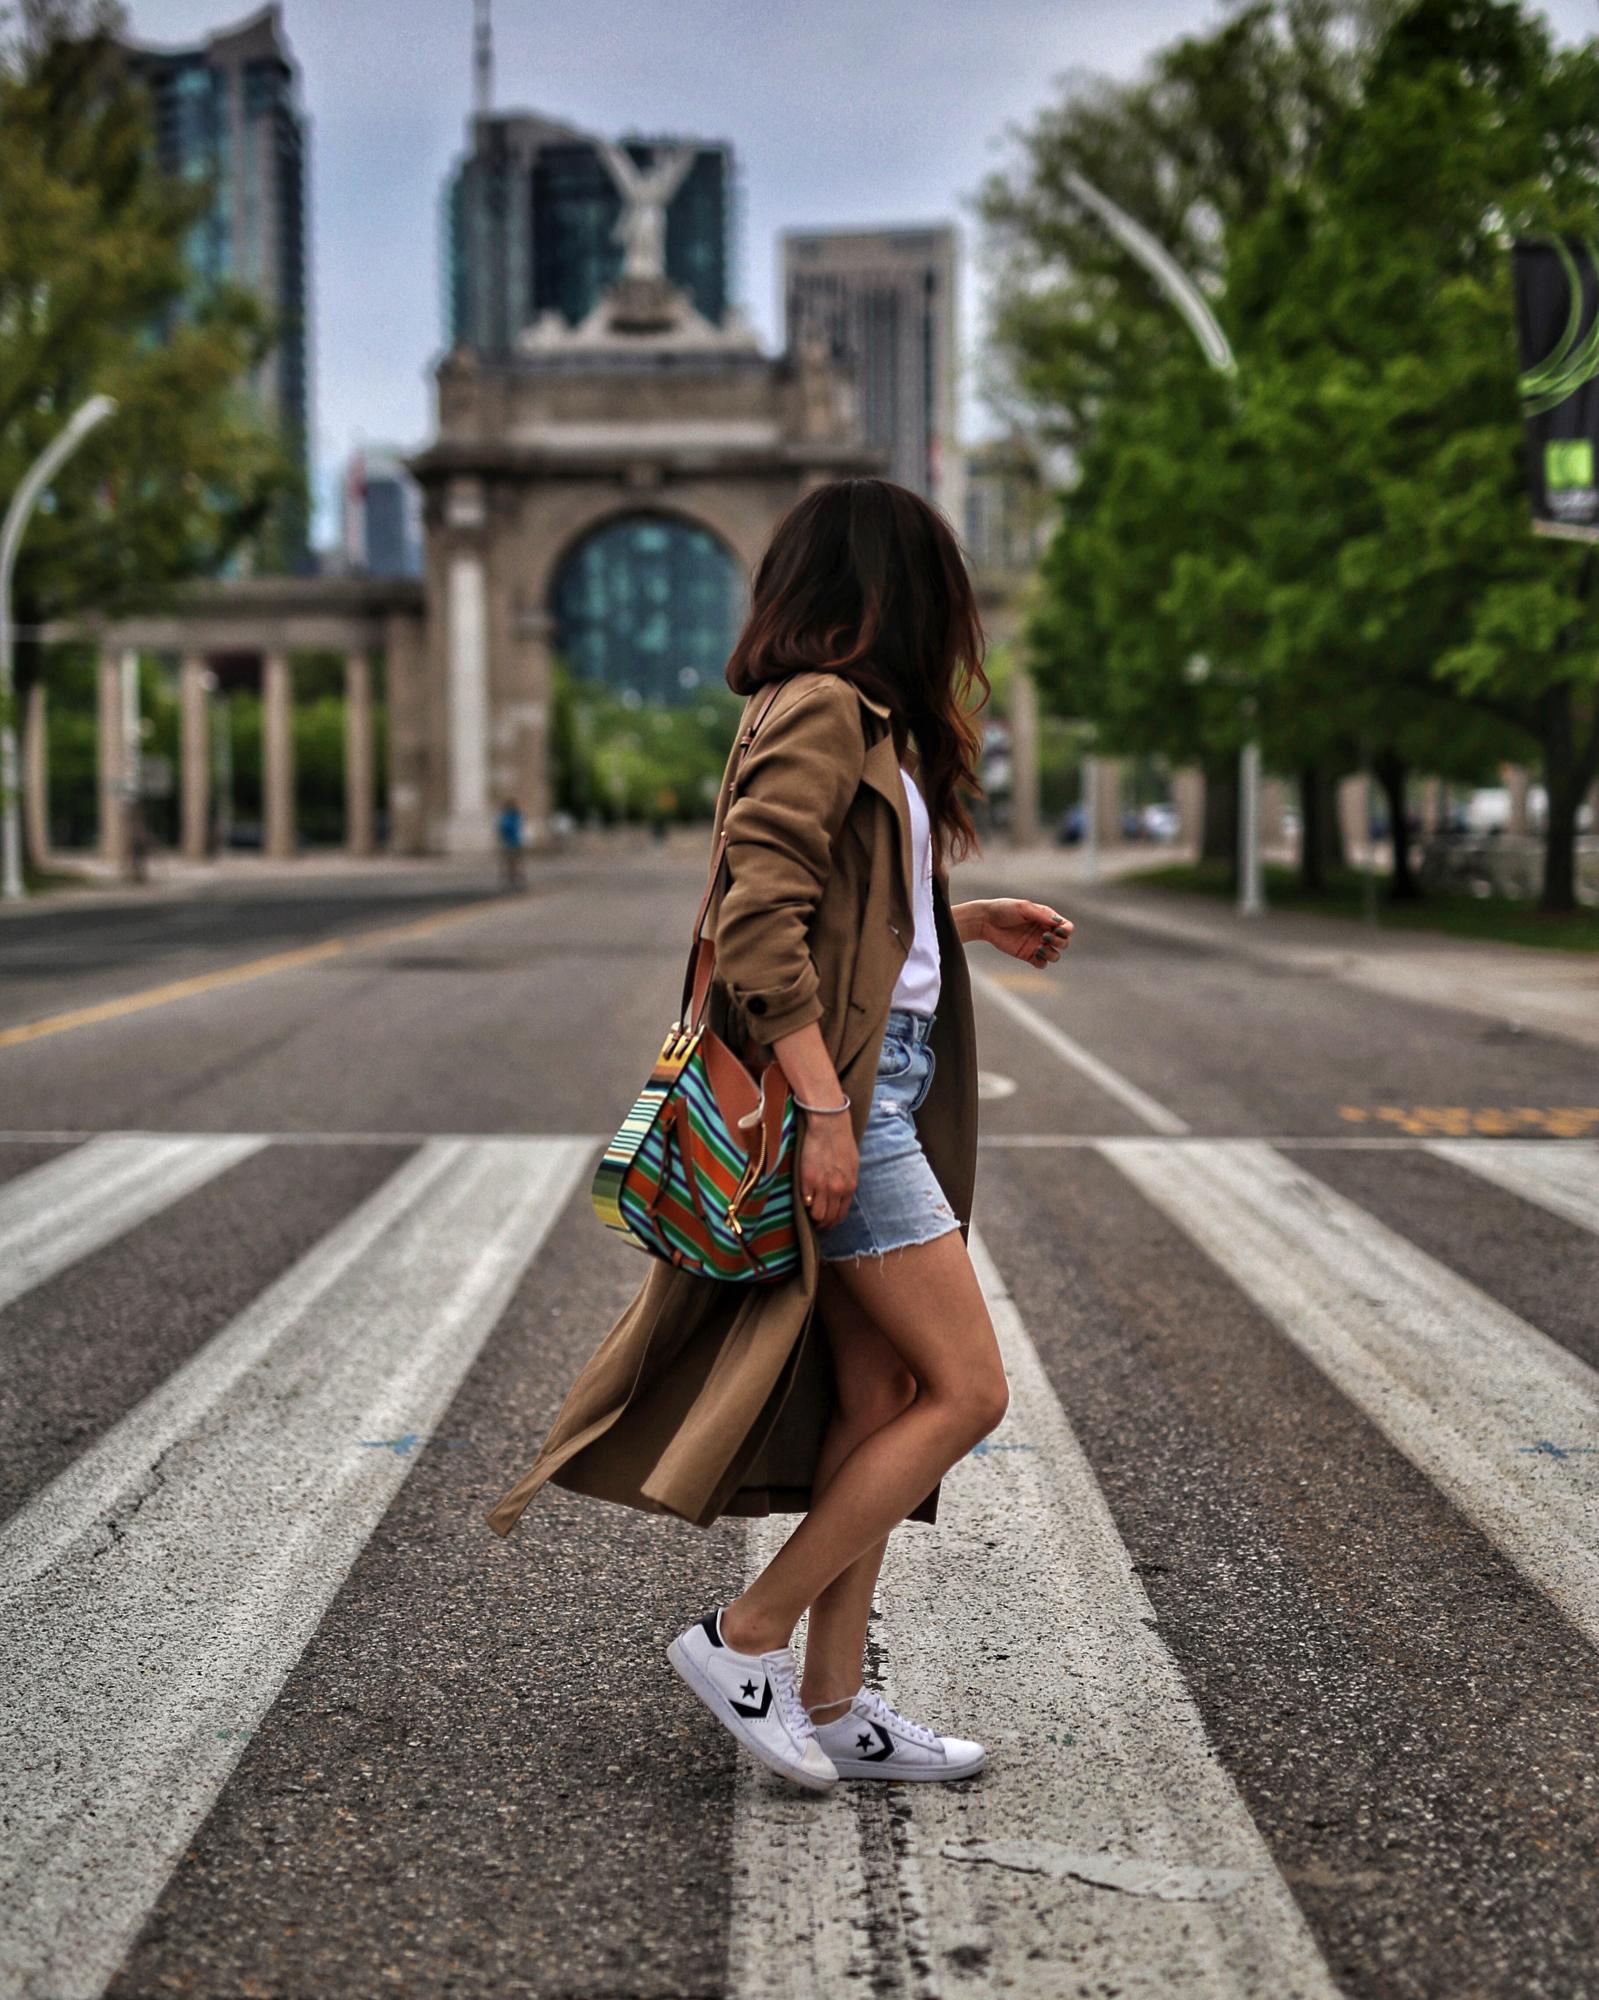 woahstyle.com 2018 - zara linen trench coat, free people cut off shorts, converse one stars, loewe striped small hammock bag, white button up shirt - toronto street style - hotel x - nathalie martin 9.jpg